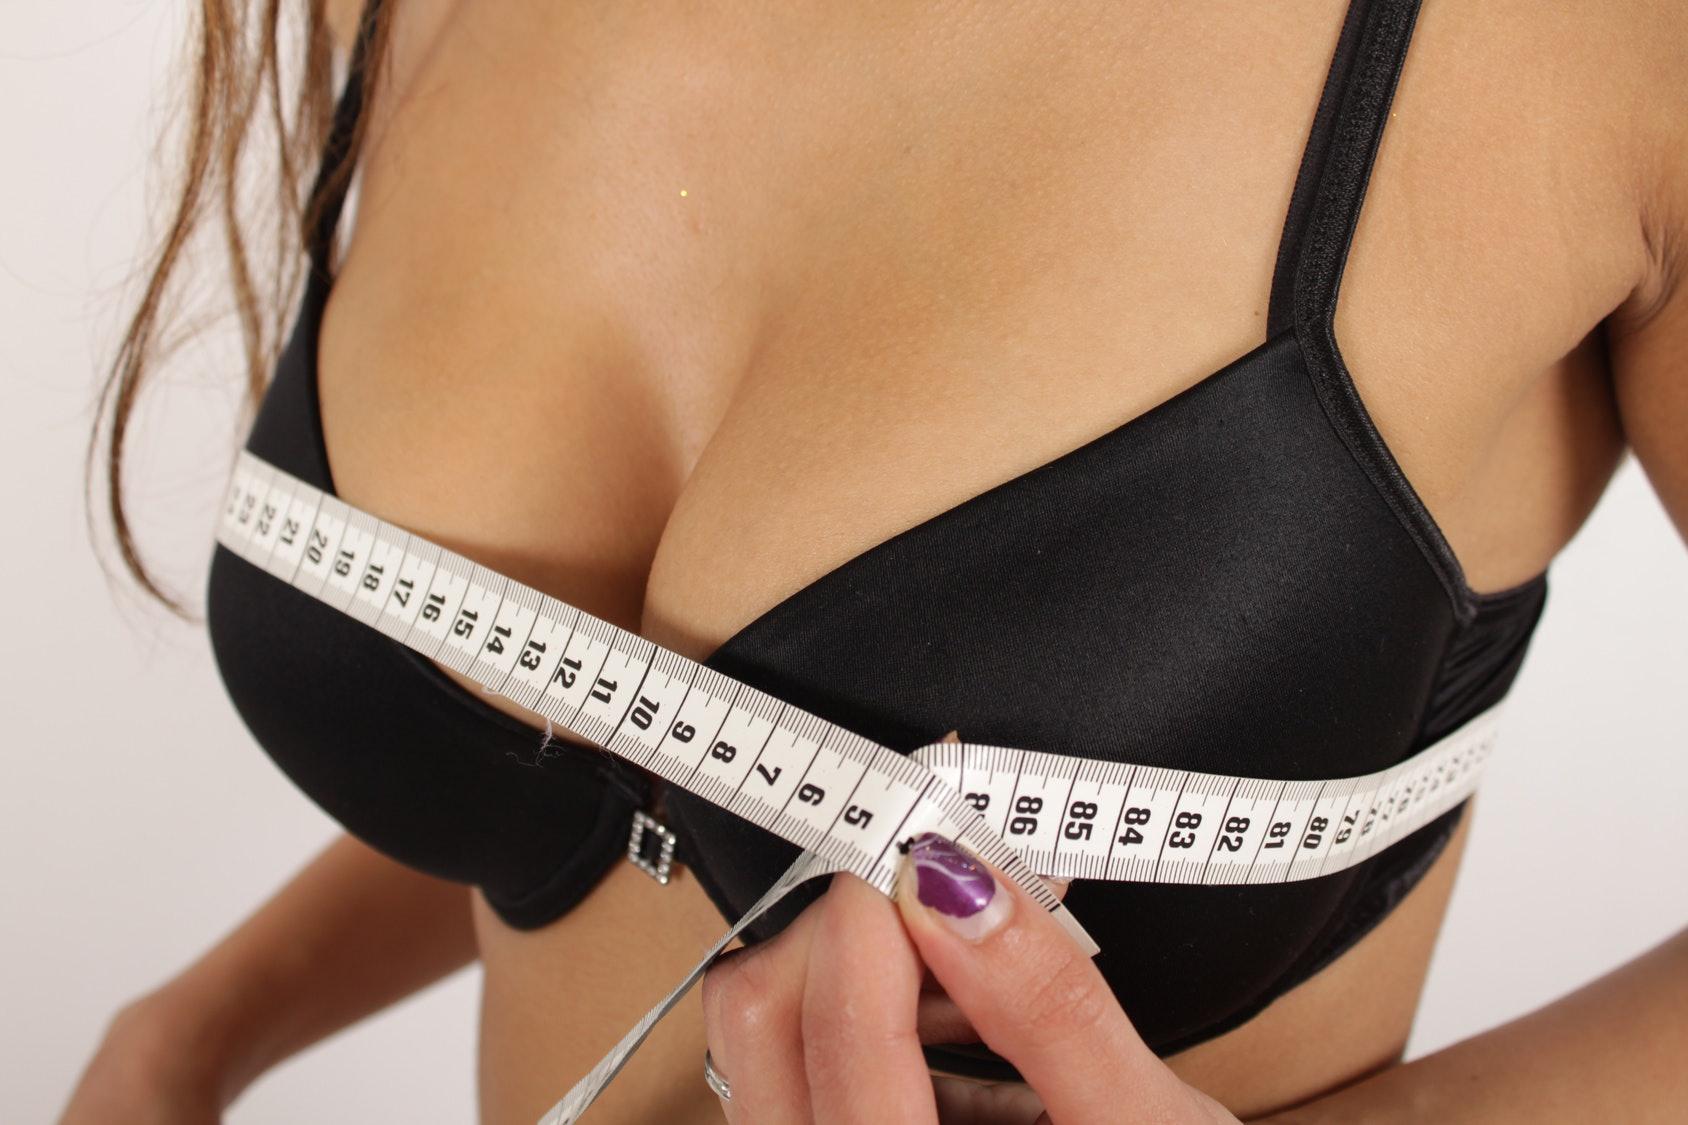 My wifes boobs keep getting bigger